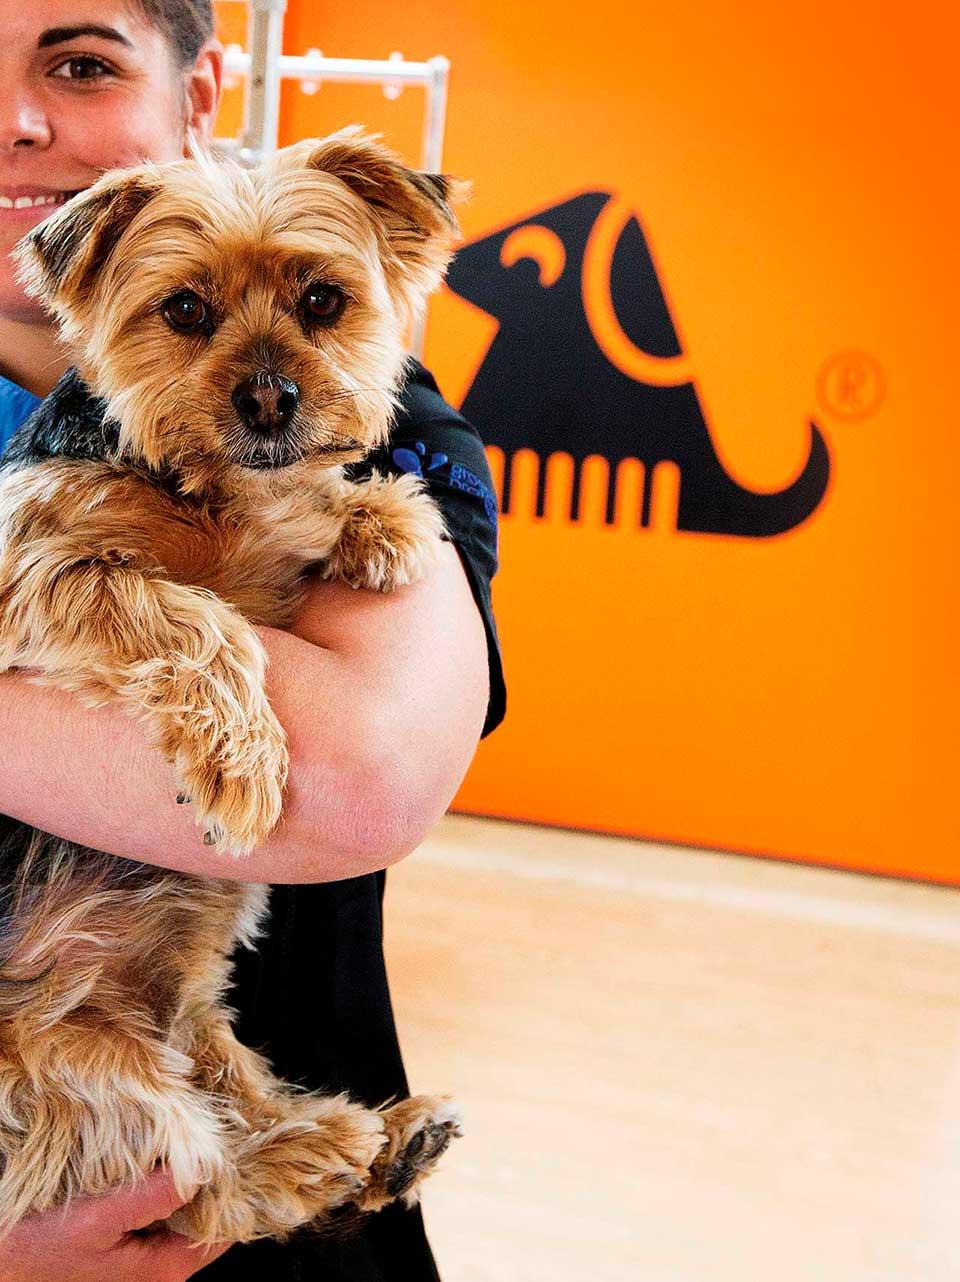 Loving Pets at The Dog Groomer